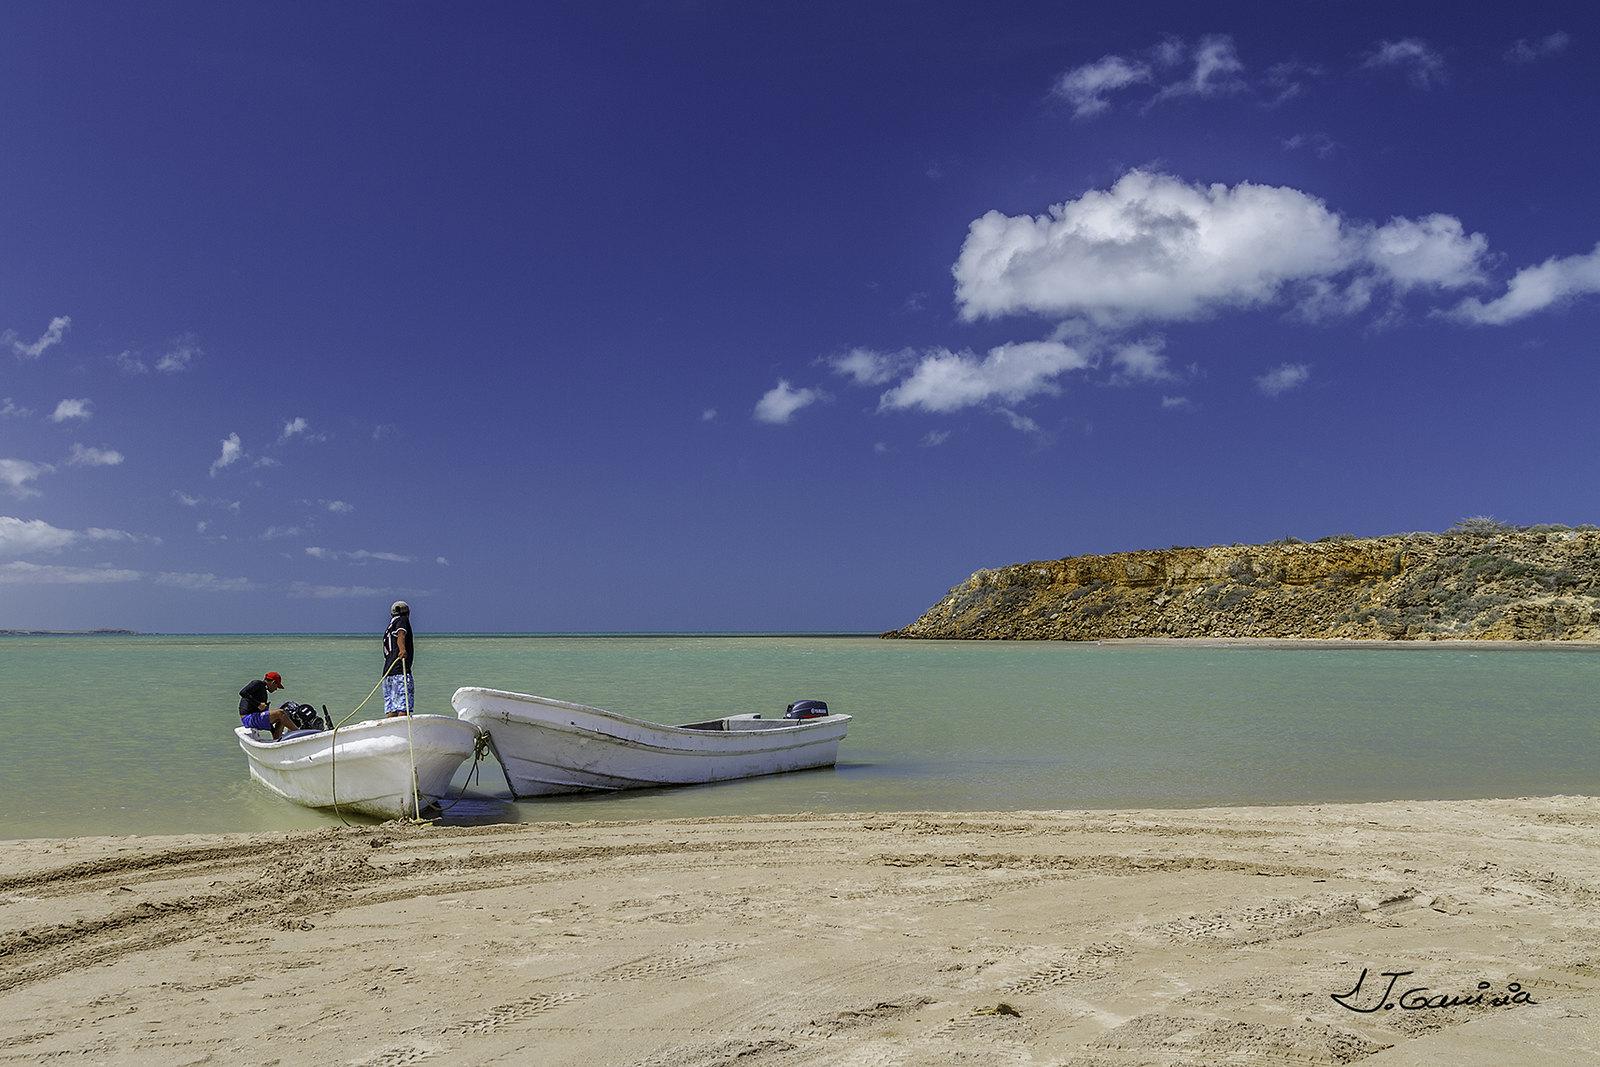 Bahía Hondita. Foto: Jorge Gaviria, www.flickr.com